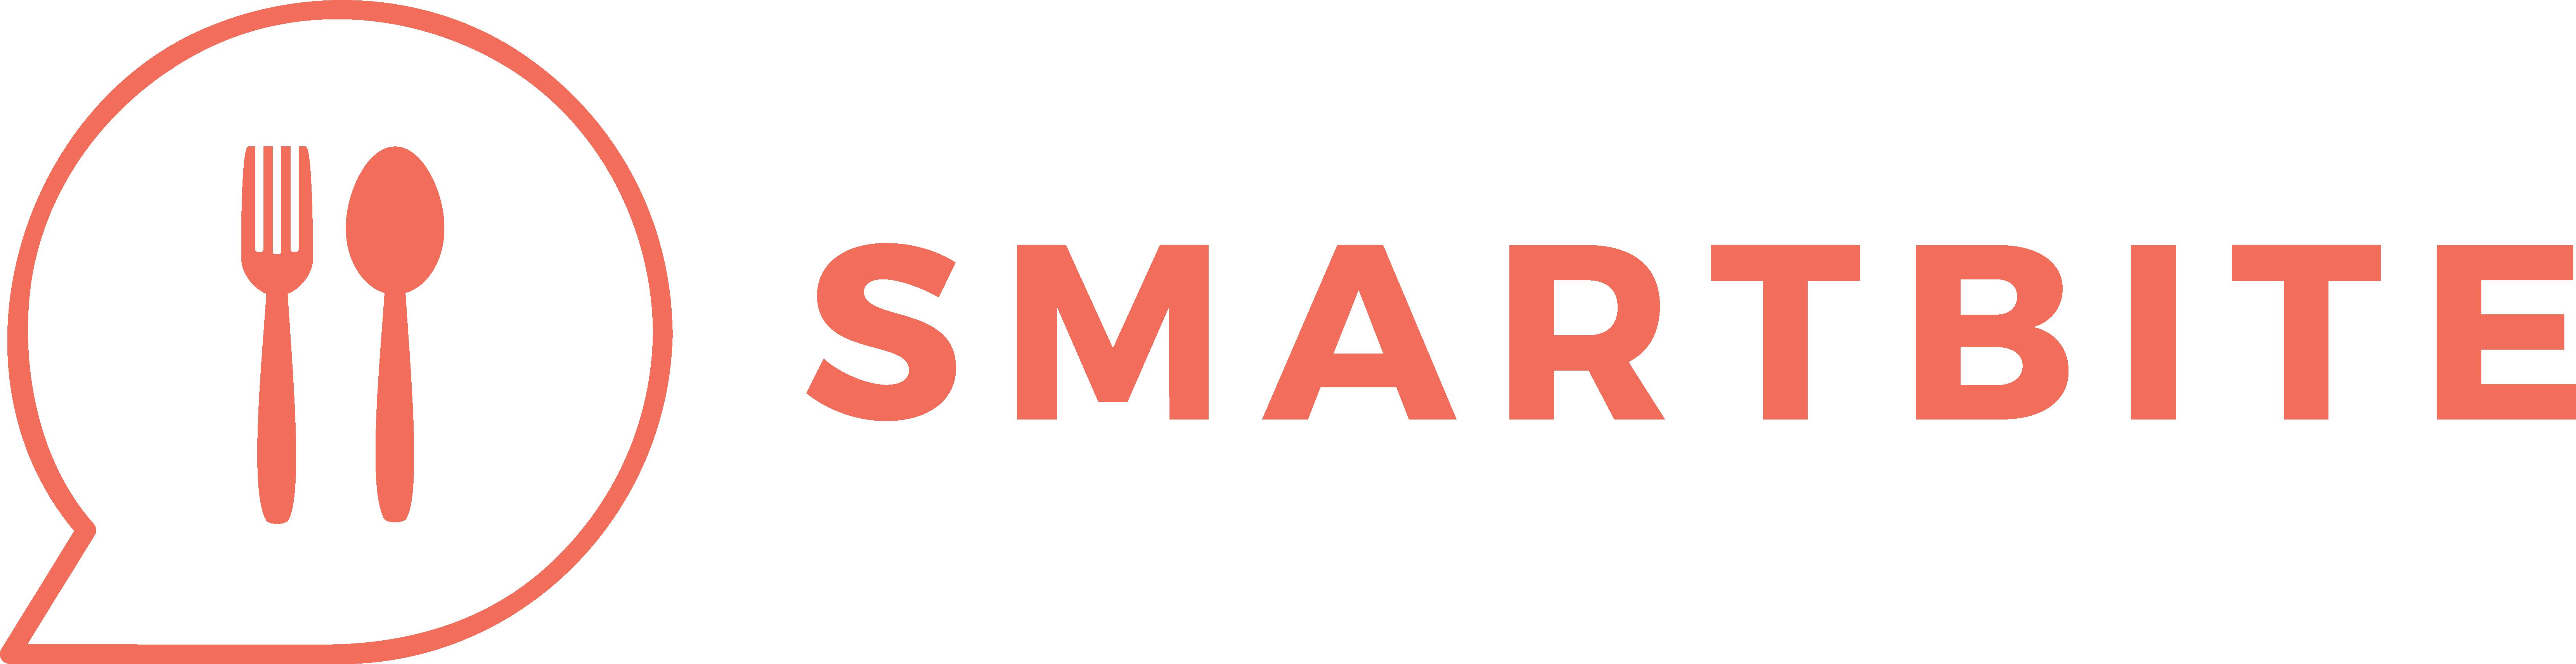 smartbite_logo